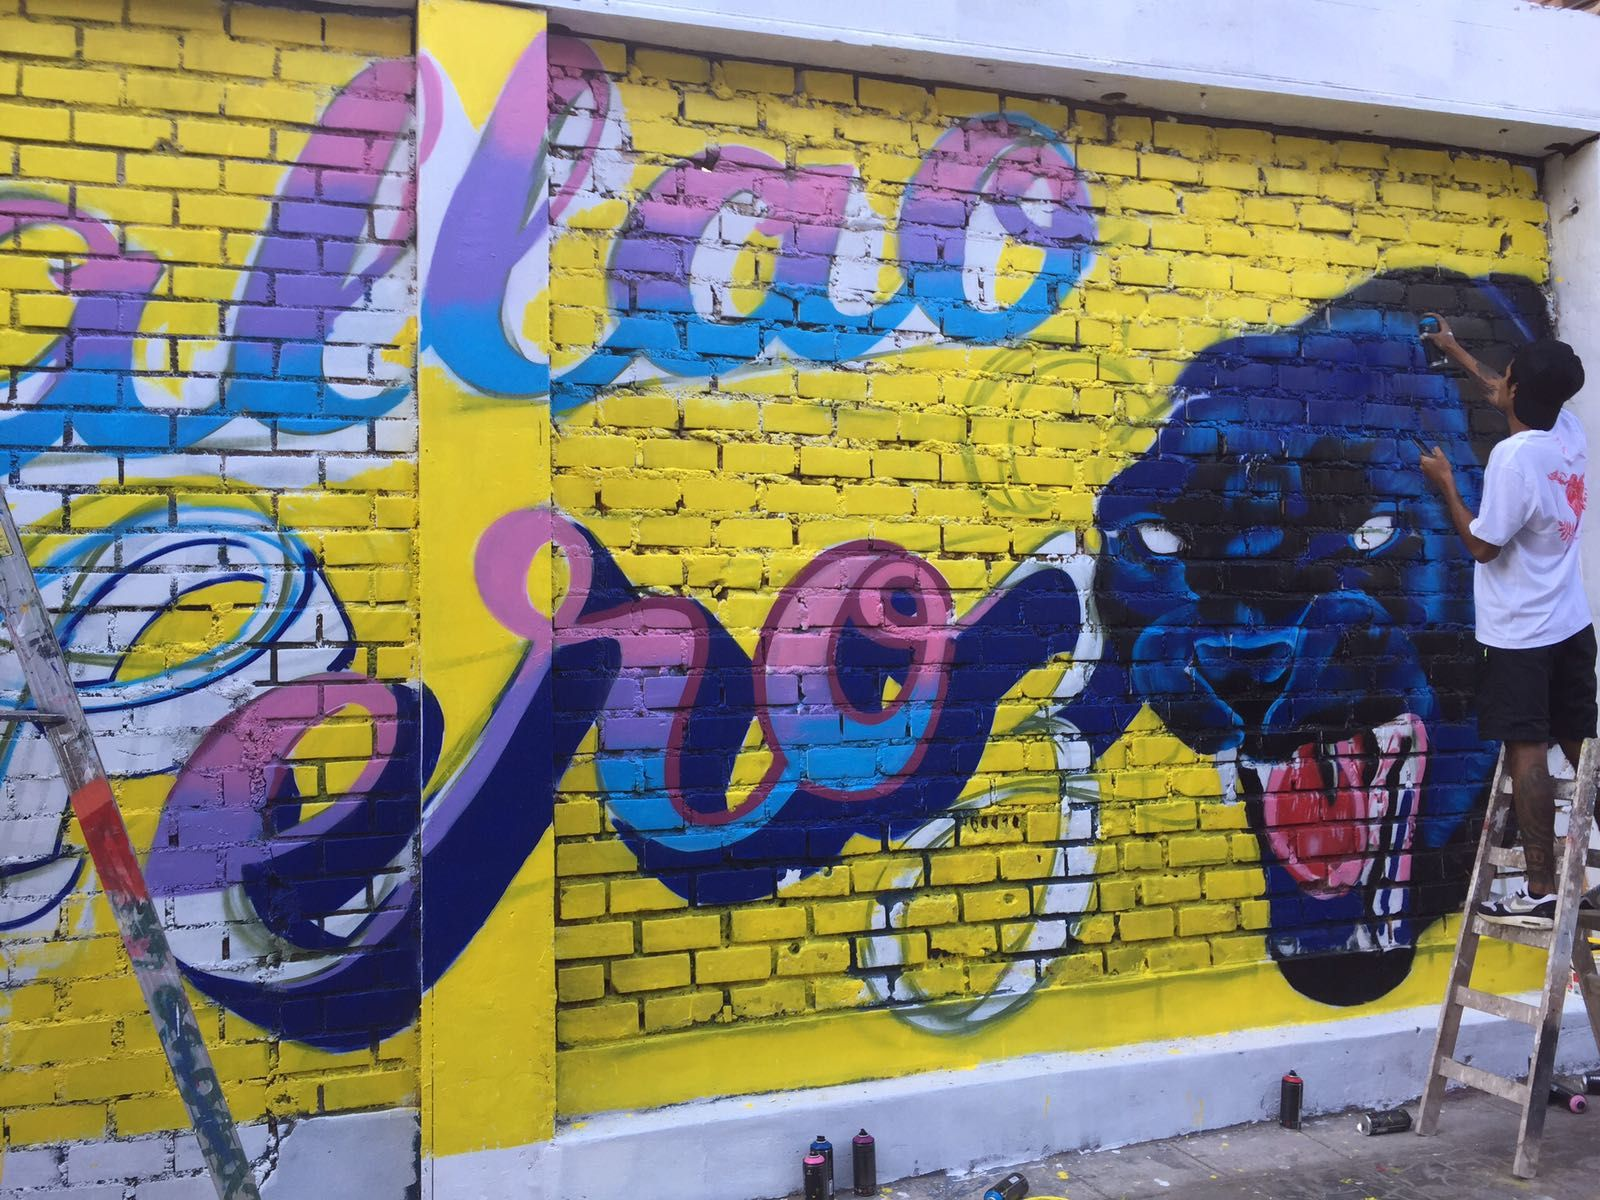 Lima, Peru (Callao Monumental) - Street Art & Graffiti. Brand new ...